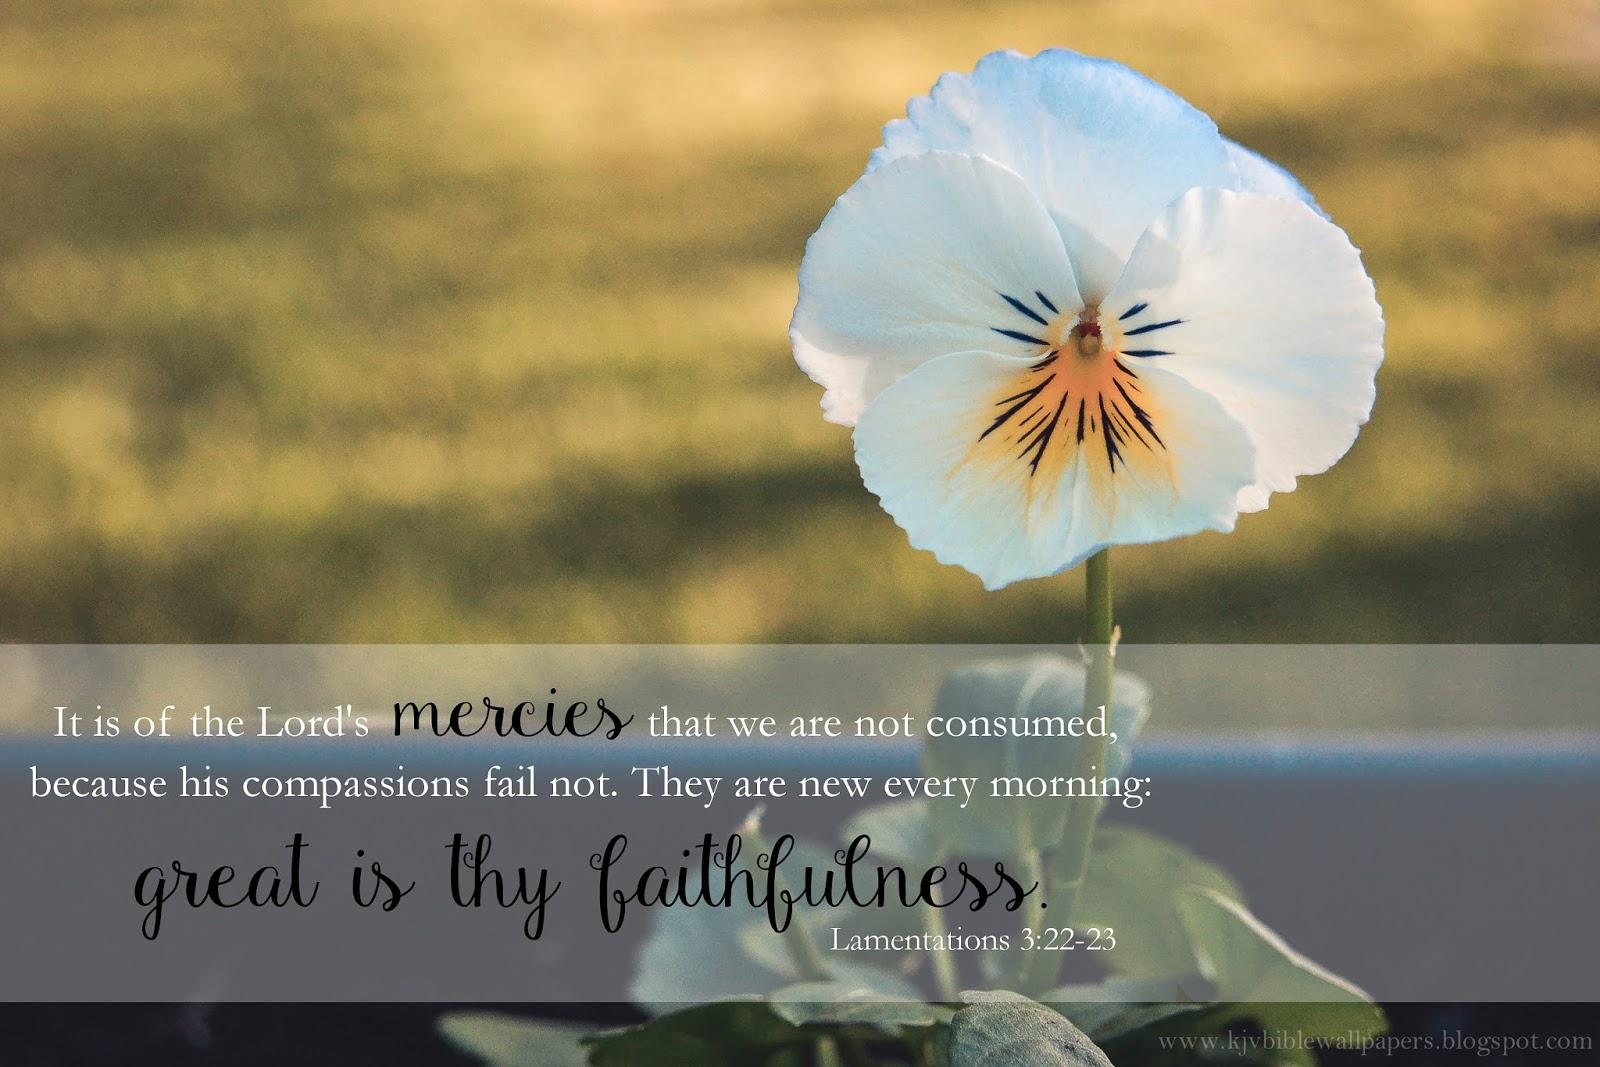 KJV Bible Wallpapers: Great is Thy Faithfulness ...